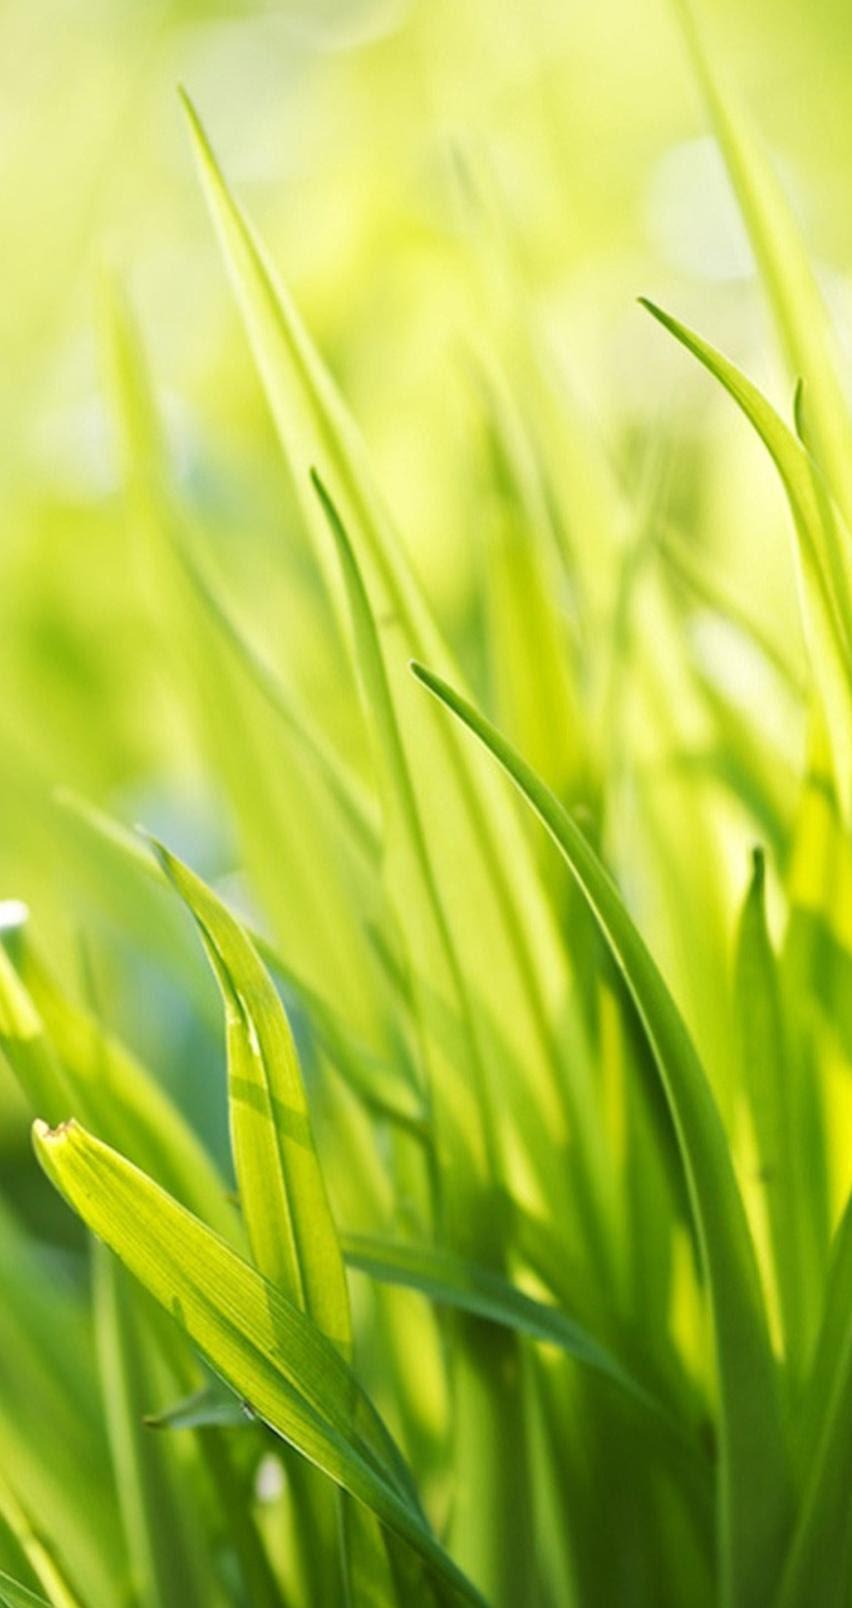 Green Grass Nature Close Up Photo Hd Wallpaper Pack Wallpapers